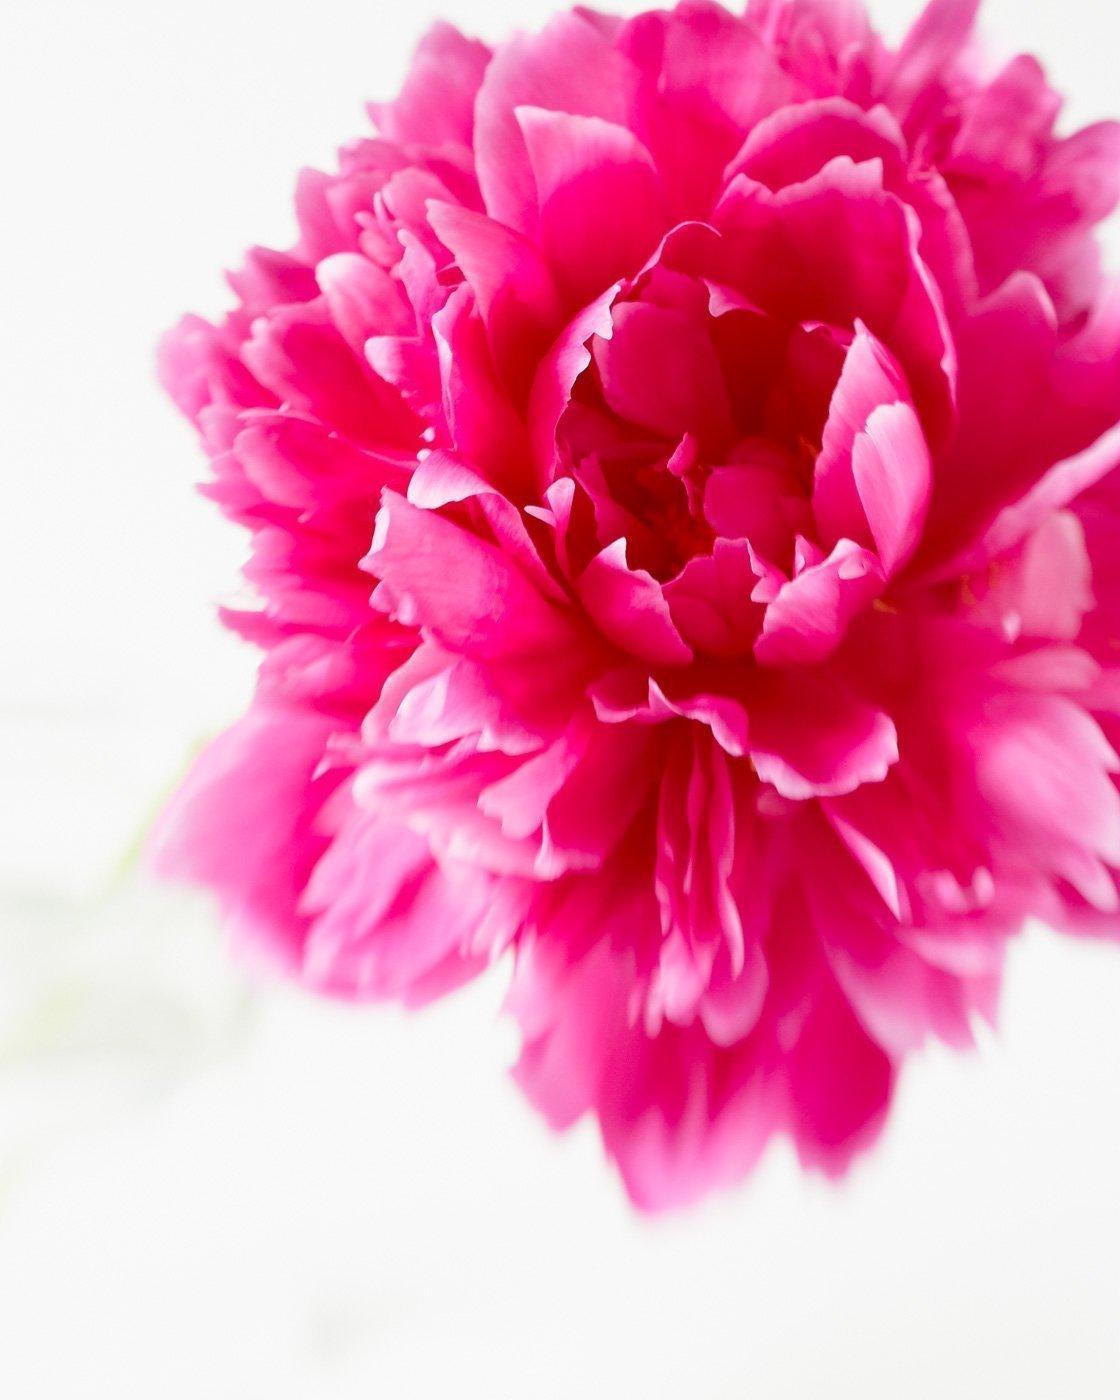 Flower Photography - Peony 16